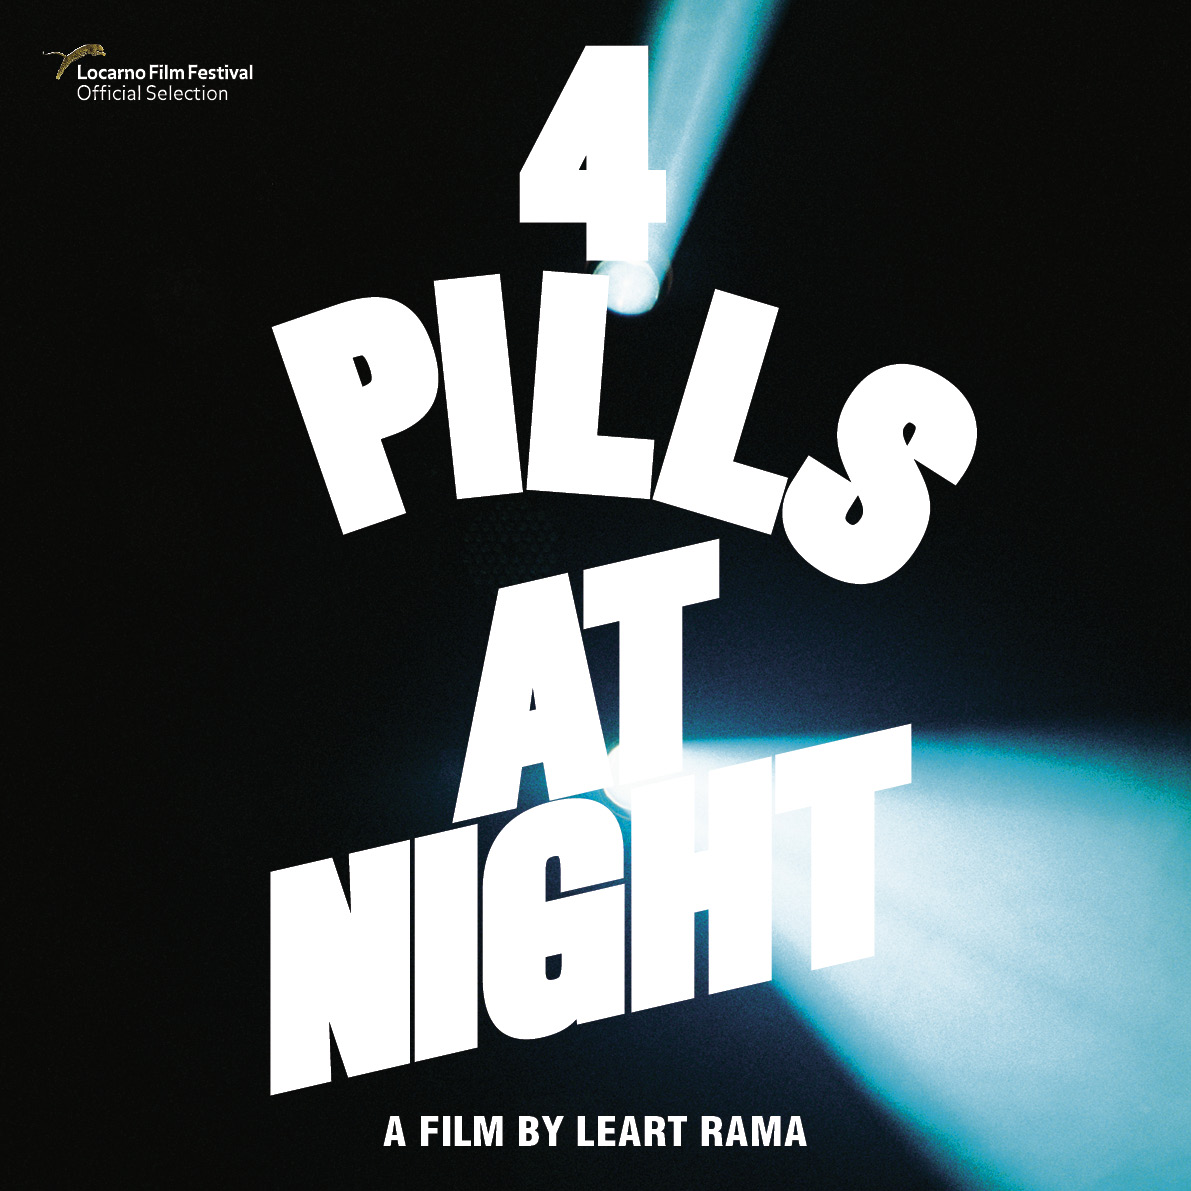 4 PILLS AT NIGHT AT LOCARNO FILM FESTIVAL